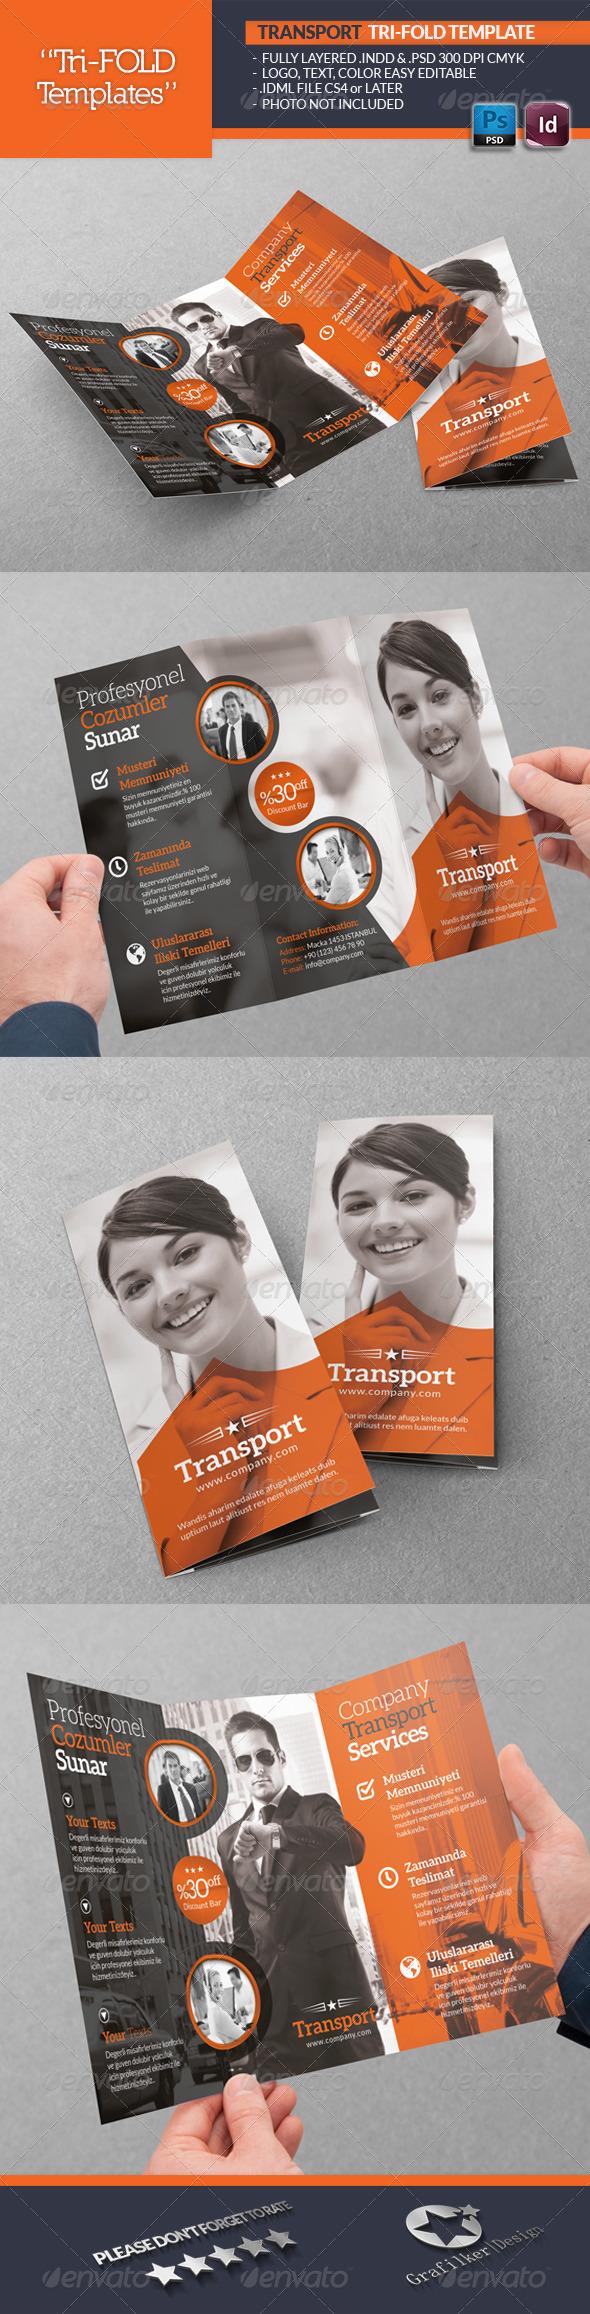 GraphicRiver Transport Tri-Fold Template 5557965